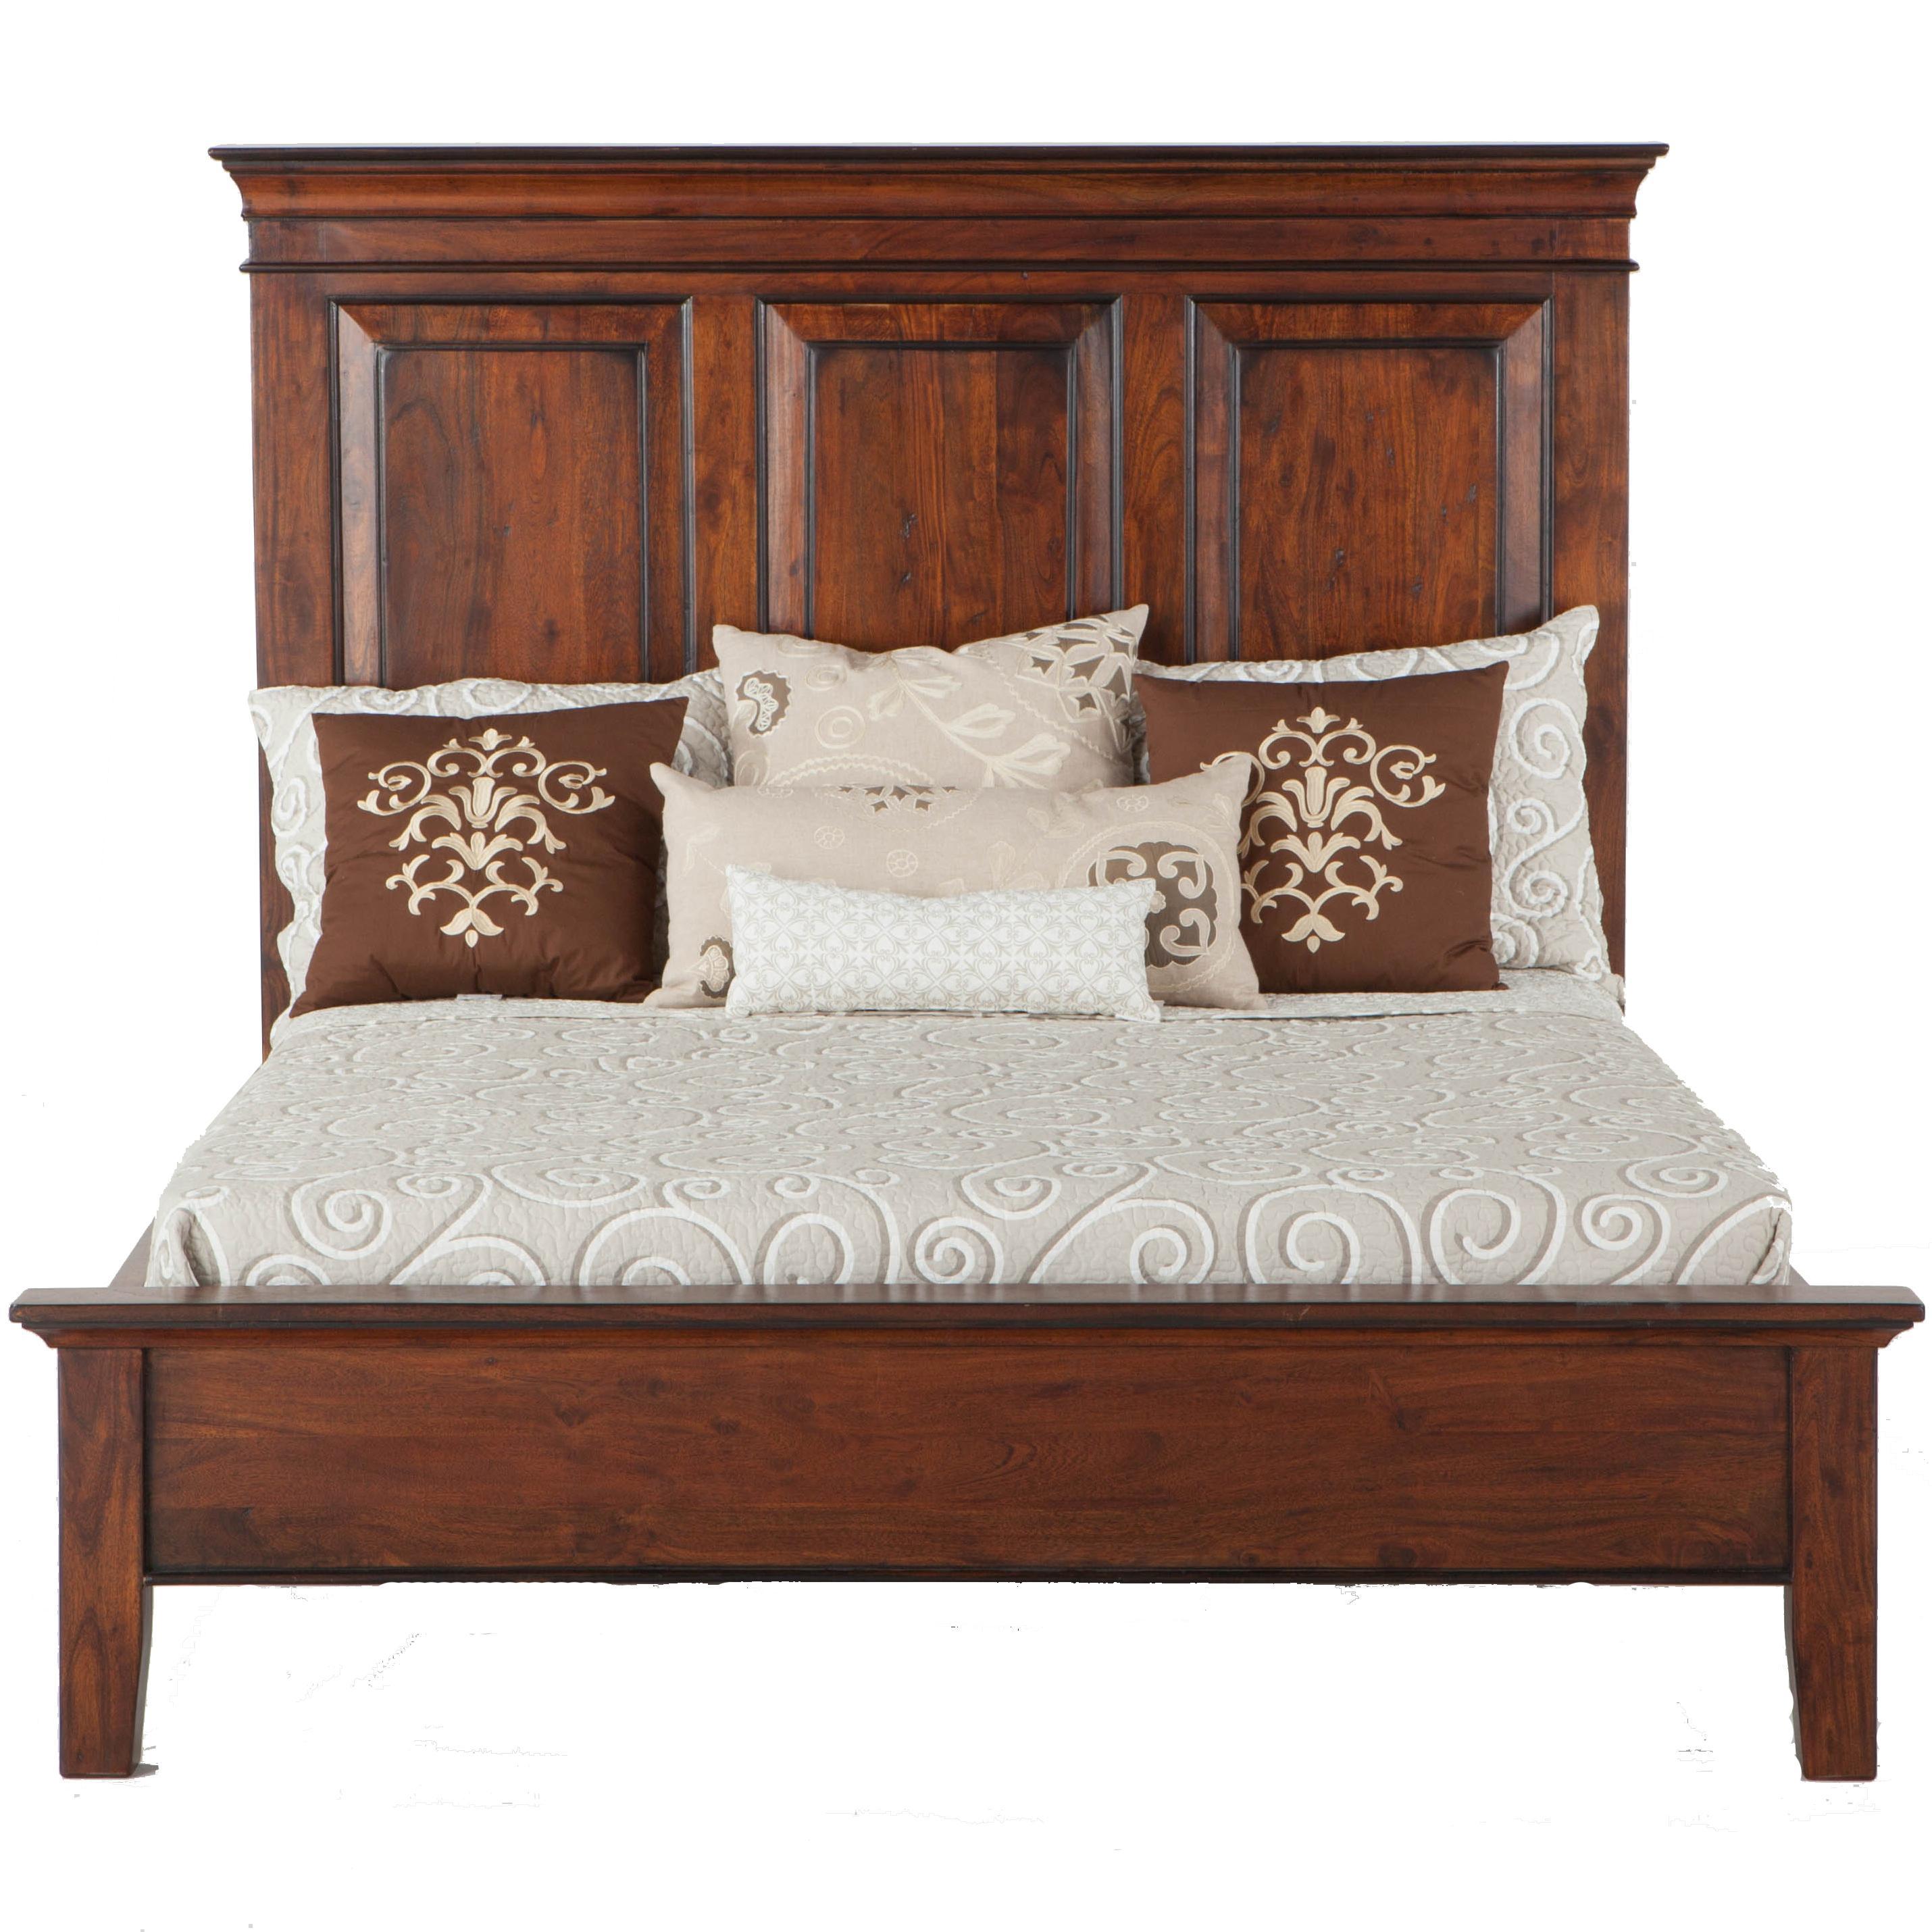 BeGlobal Timber Ridge Queen Panel Bed - Item Number: FTU-PBQP-F-H-R